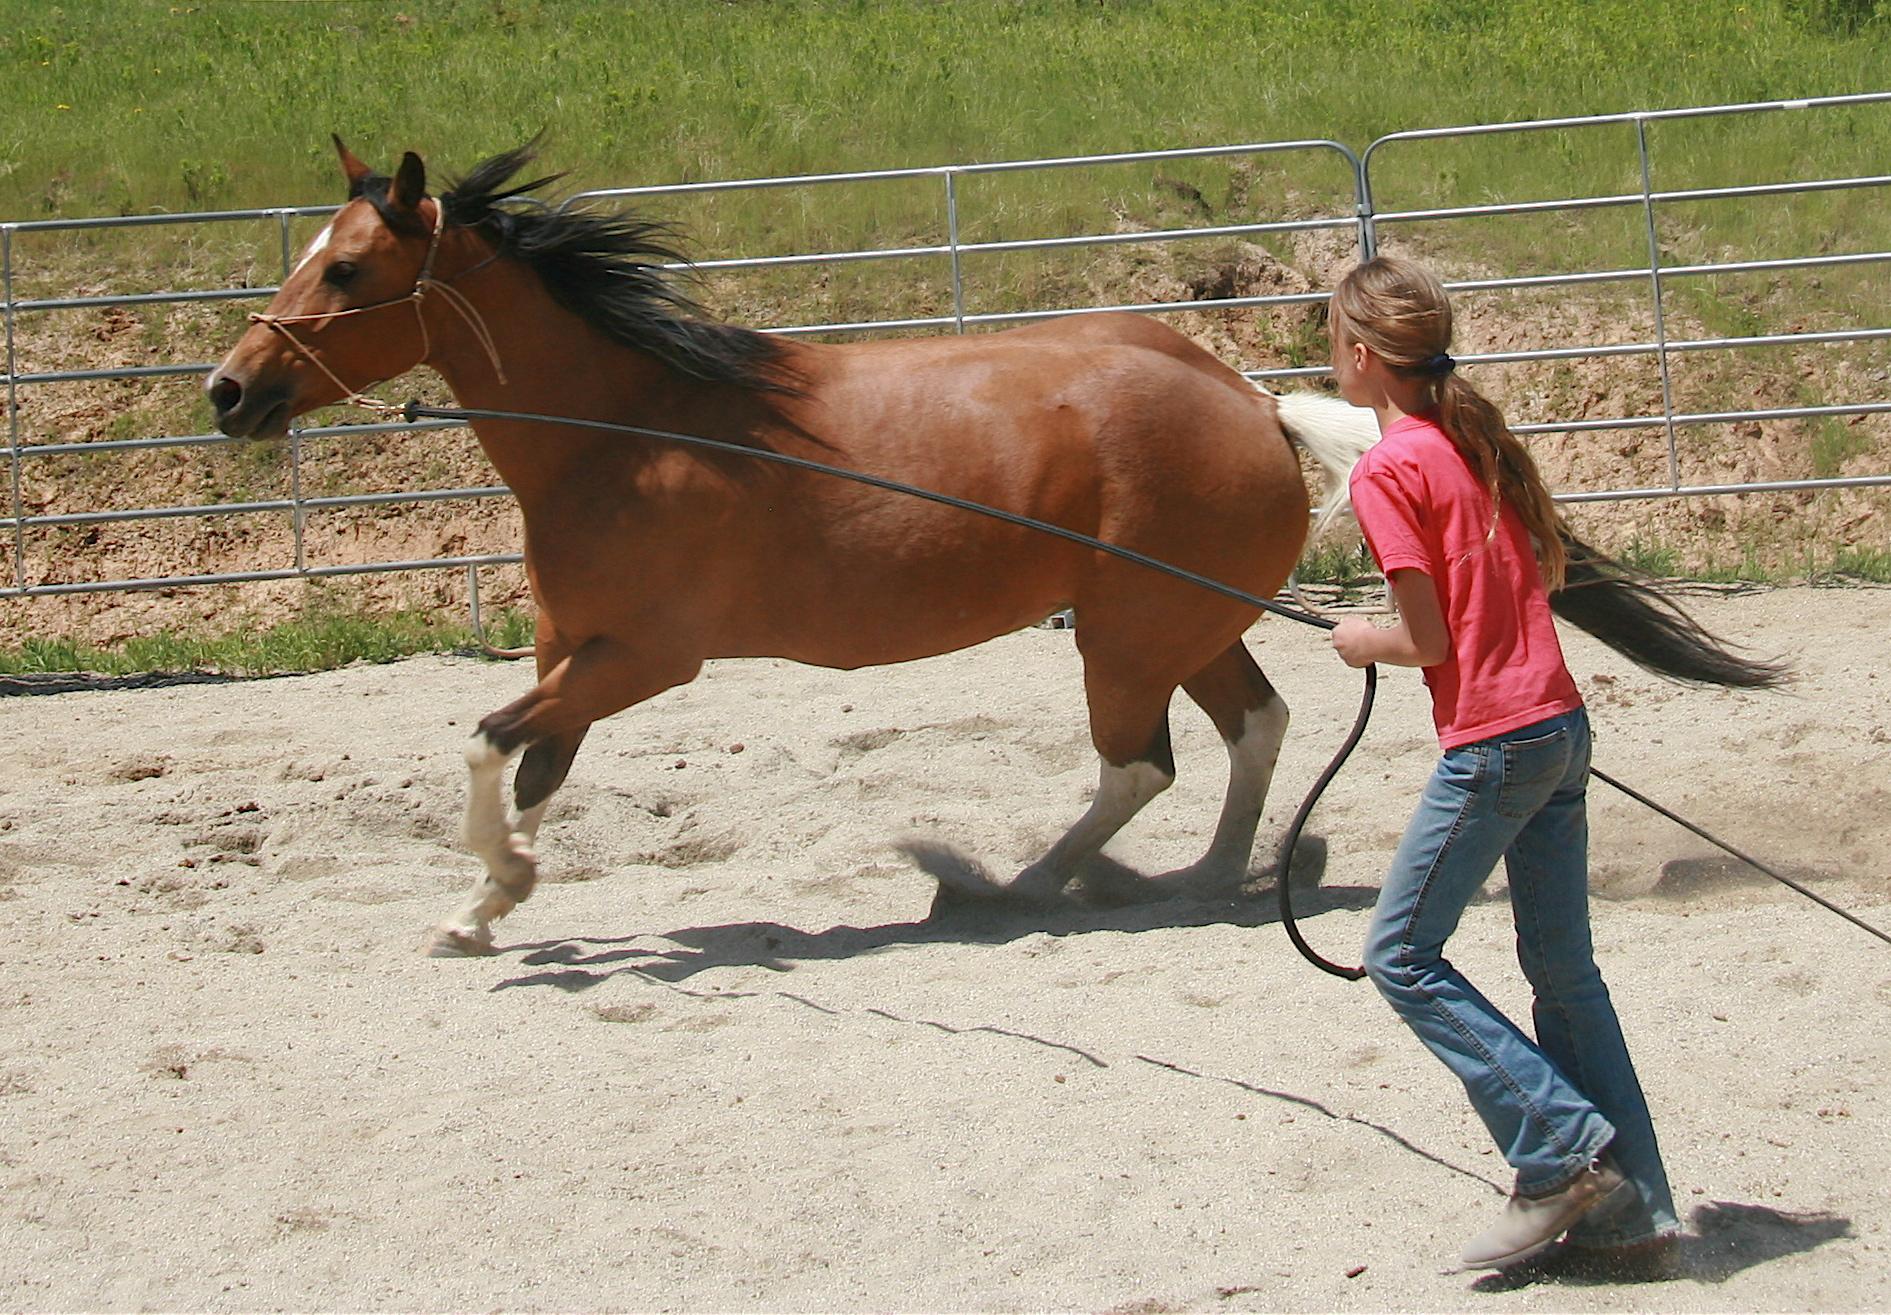 Hollywood horse trainer reveals big-screen tricks |Horse Training